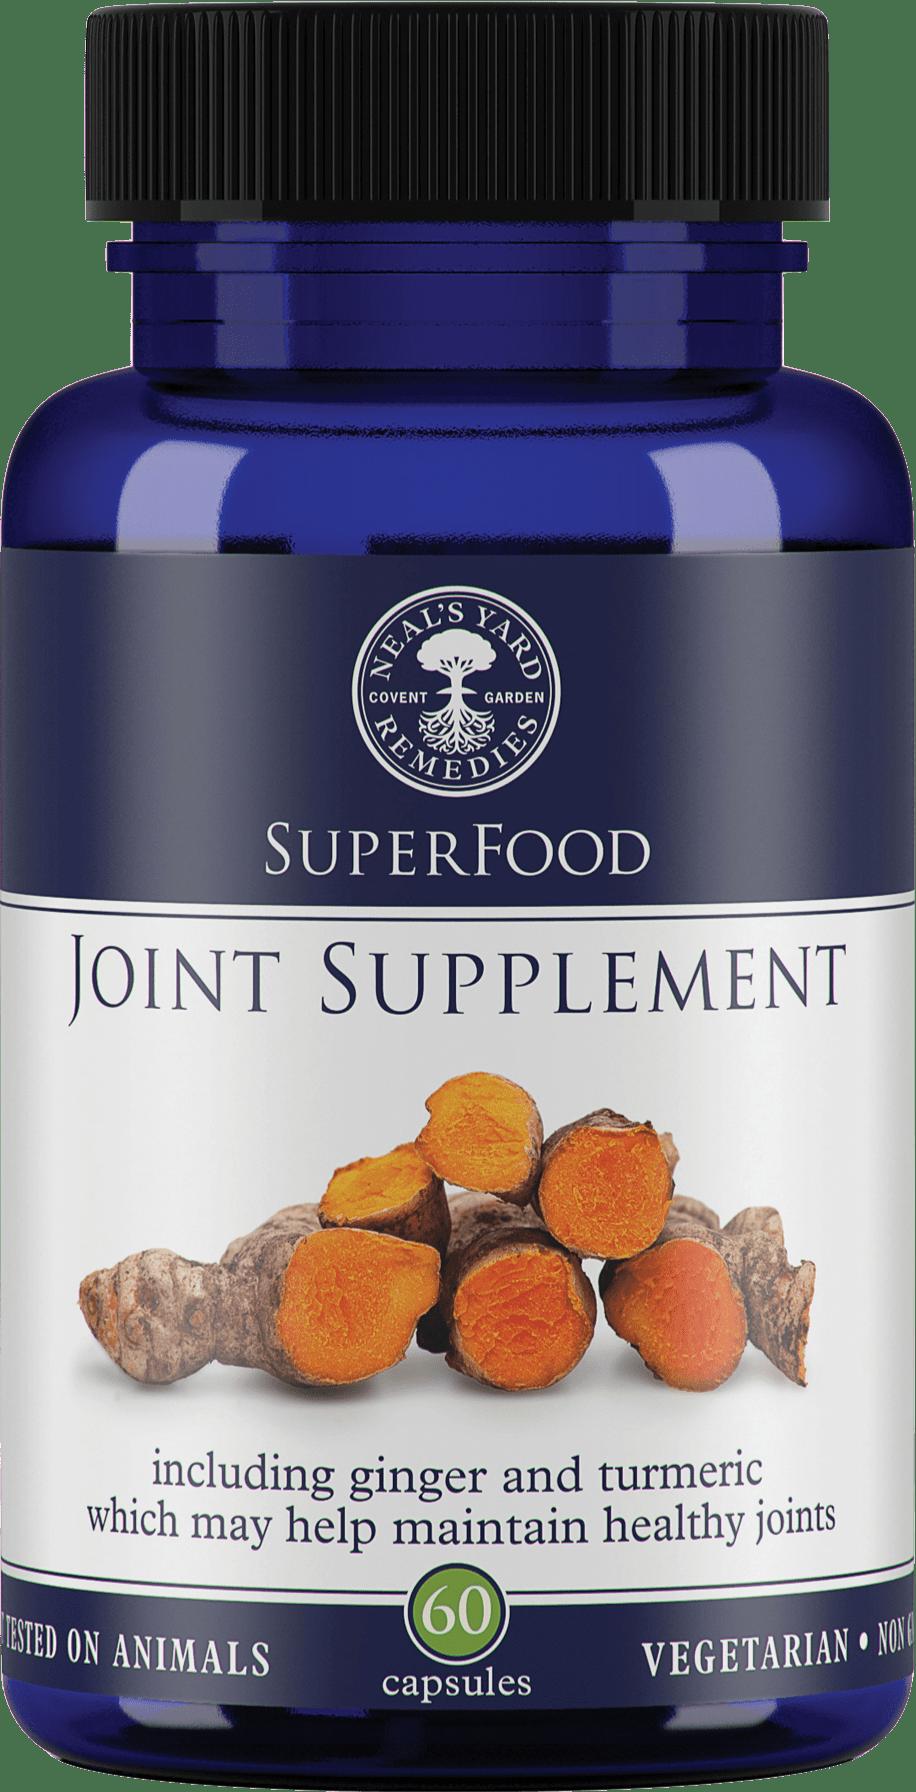 New supplement range